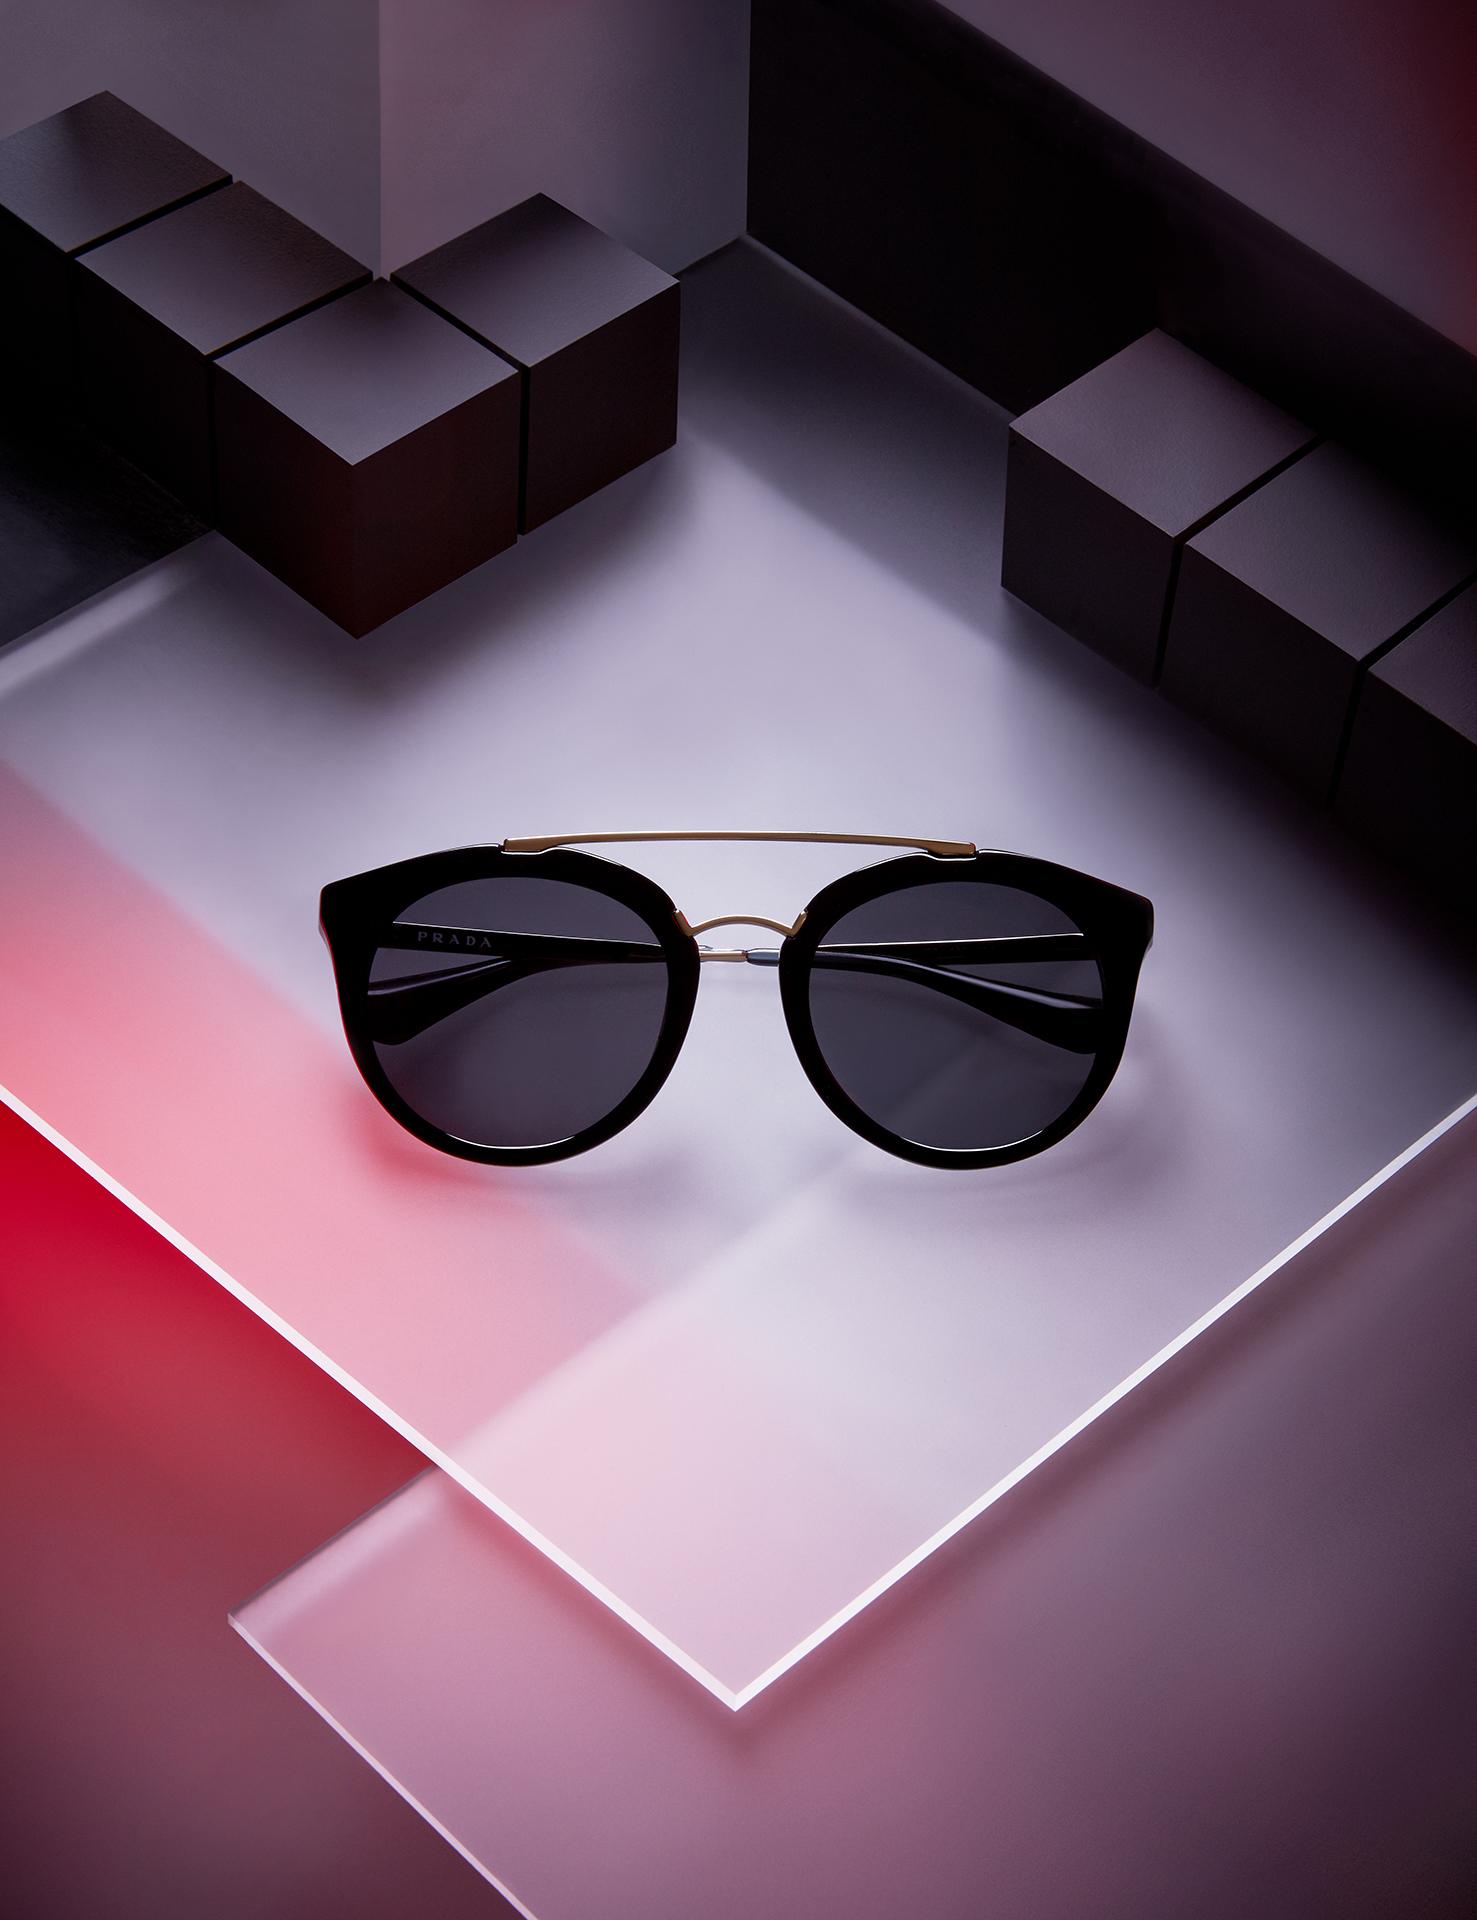 menswear_fashion_accessories_still_life_photography_editorial_neon_noir_dystopia_1.jpg